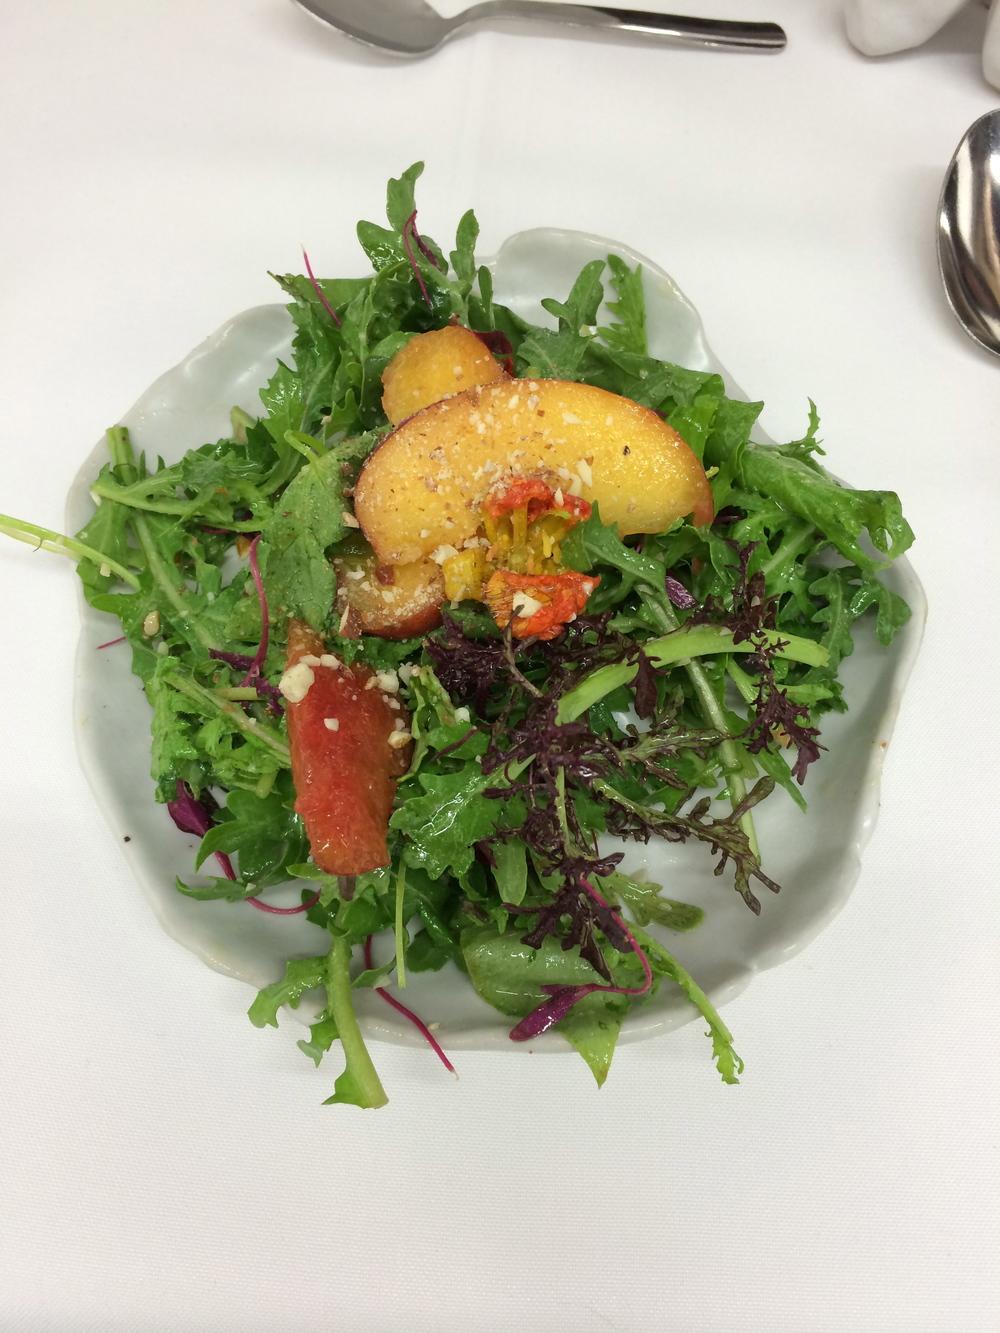 Nasturtium, Bouquet Garni, Almond, Sumac-pistachio vinaigrette